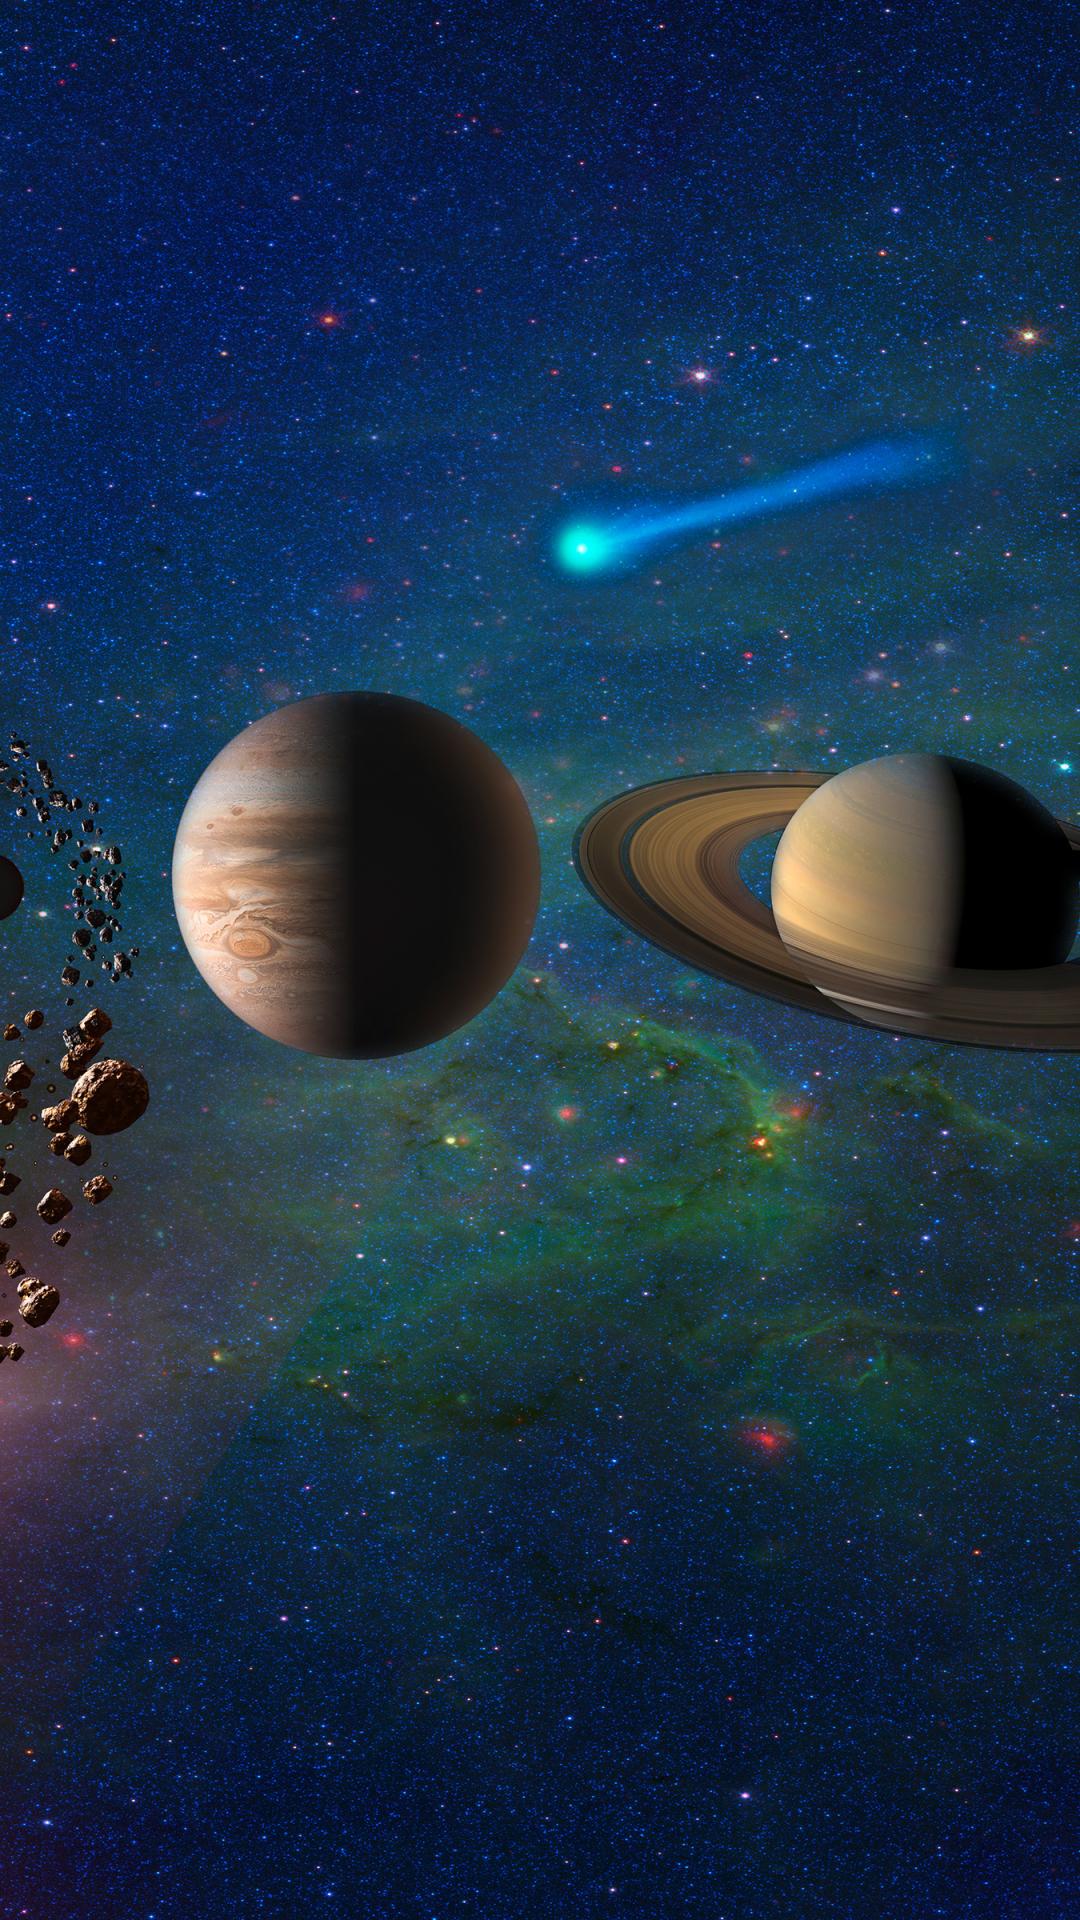 Planets In Solar System Galaxy, HD 4K Wallpaper